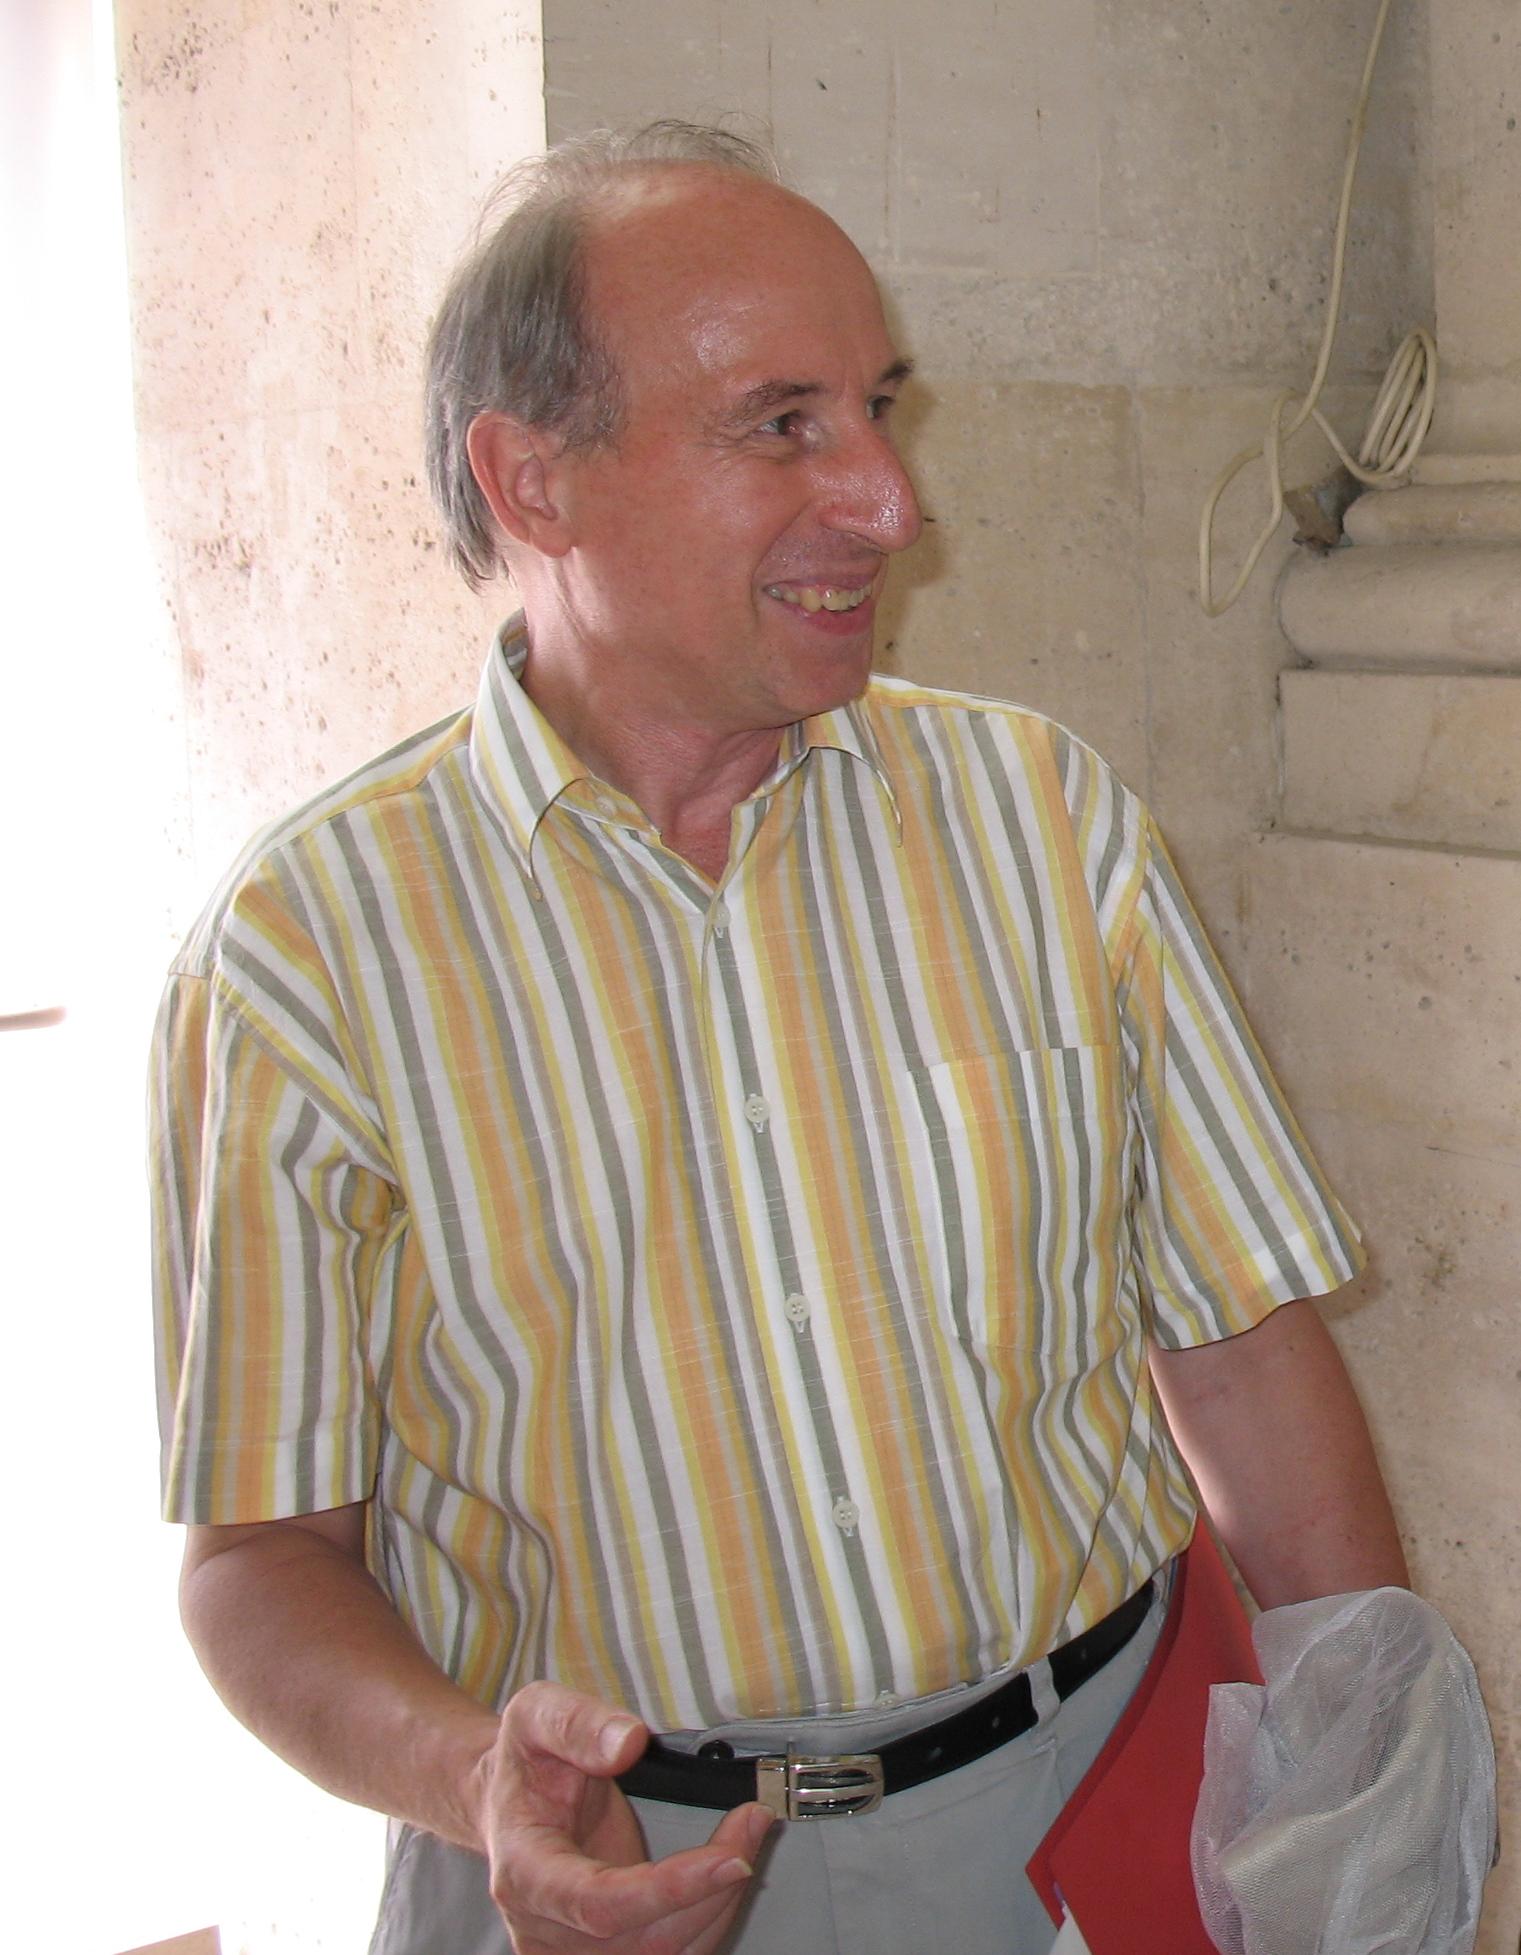 Jean-Paul Leclercq |www.artextiles.org